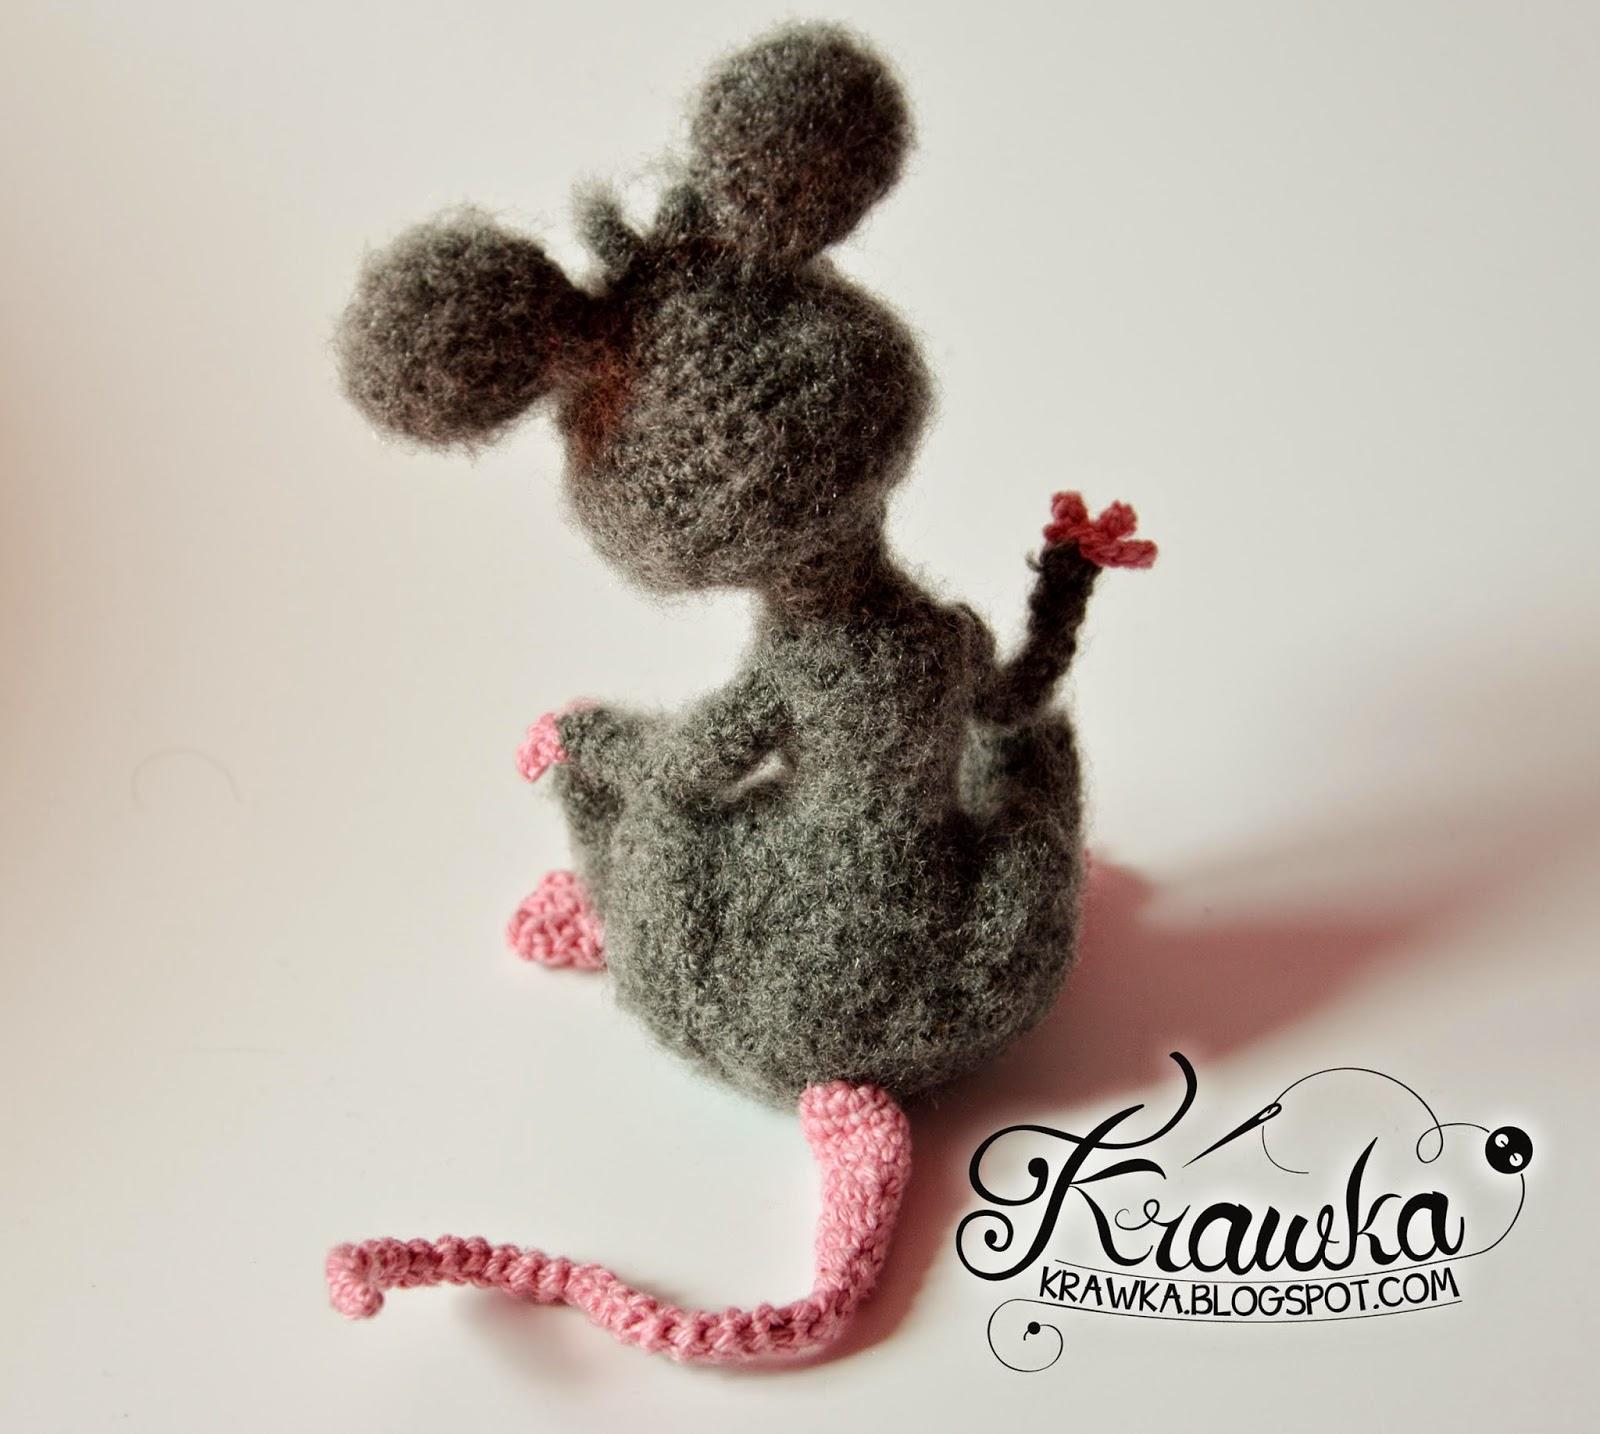 Krawka: Handmade crochet grey rat with pink nose. Cartoon rat character